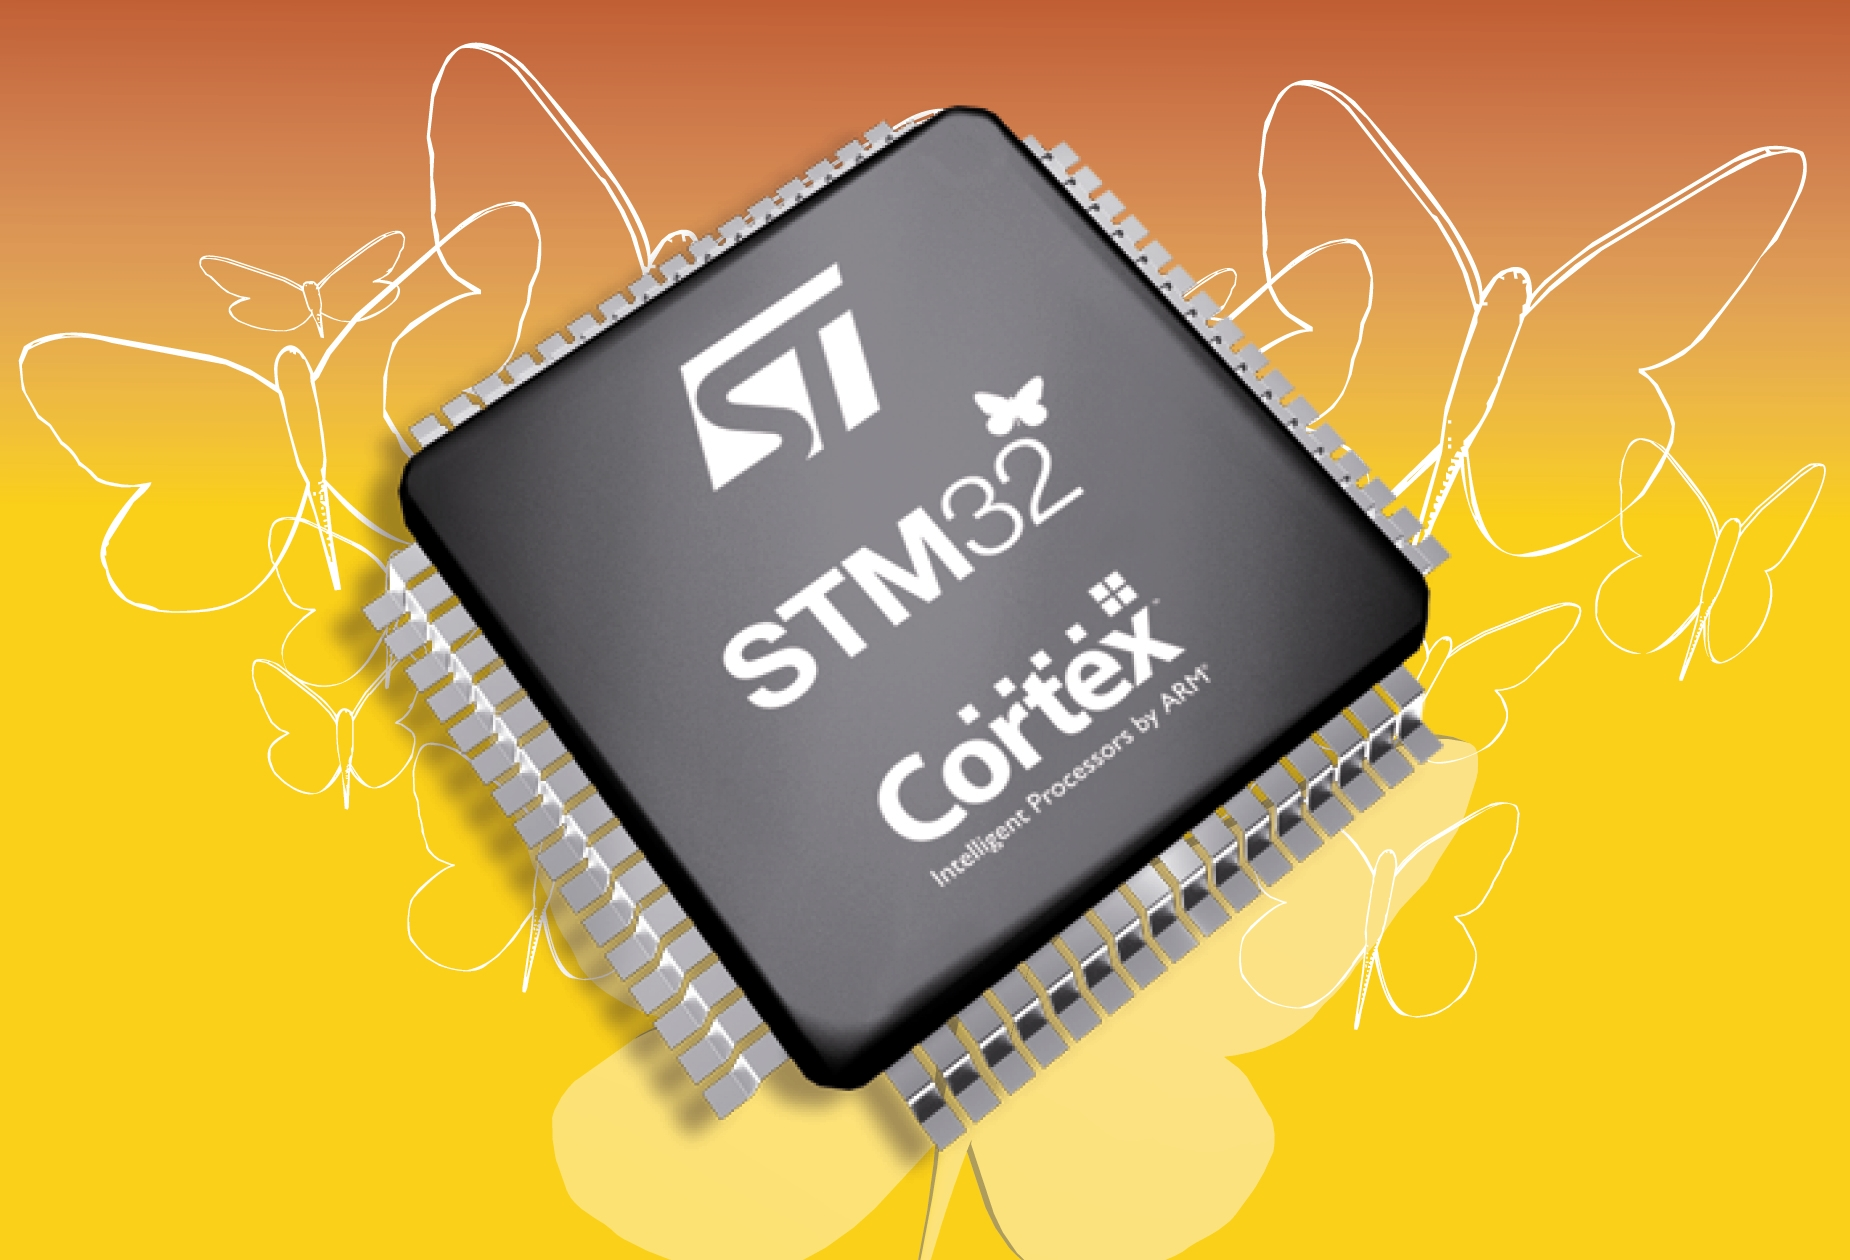 STM32资源专题(二)--中级教程专辑